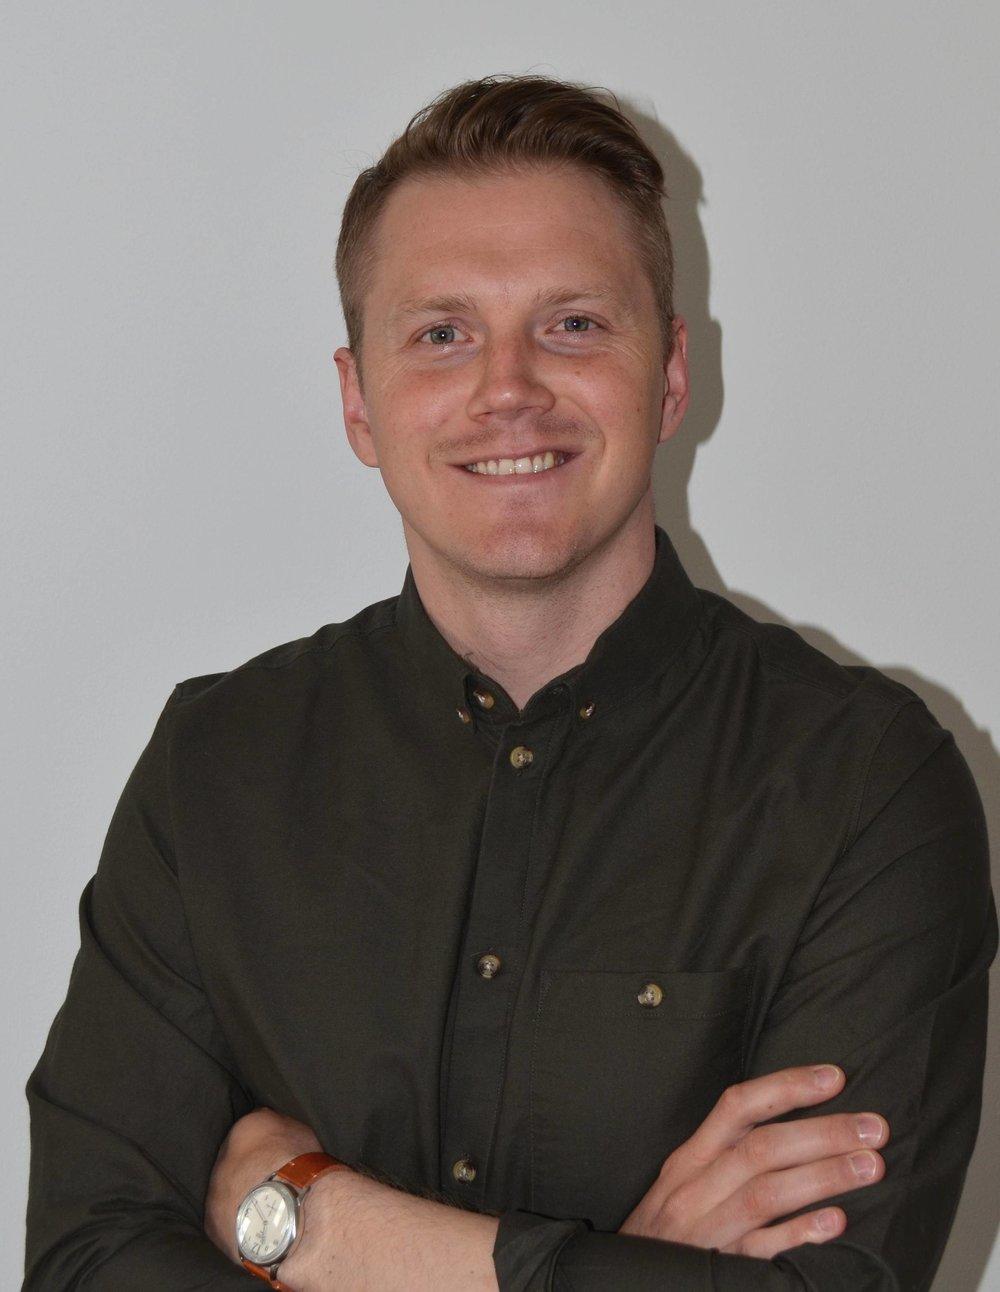 Fredrik Ingel - Founder Cotcas